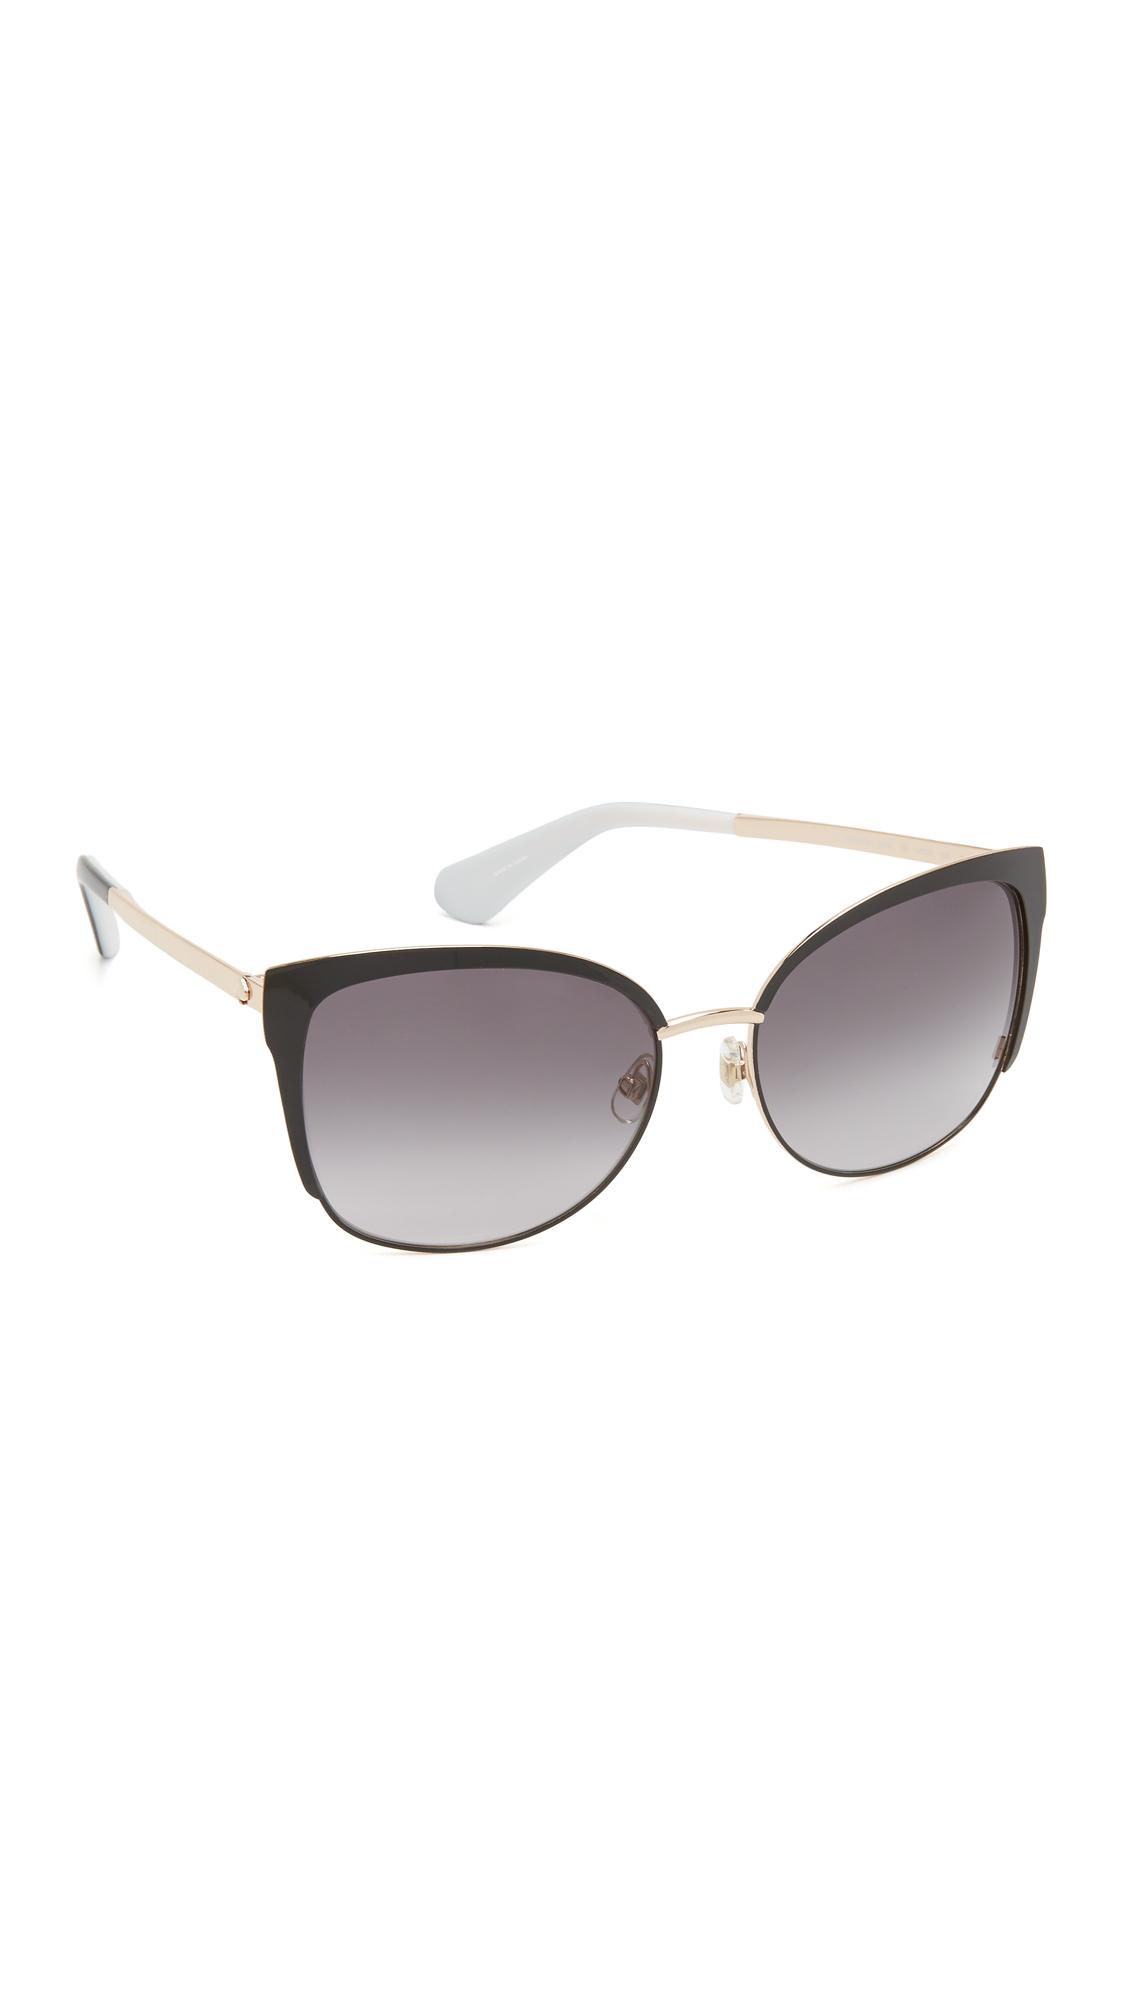 Lyst Kate Spade New York Genice Sunglasses In Black